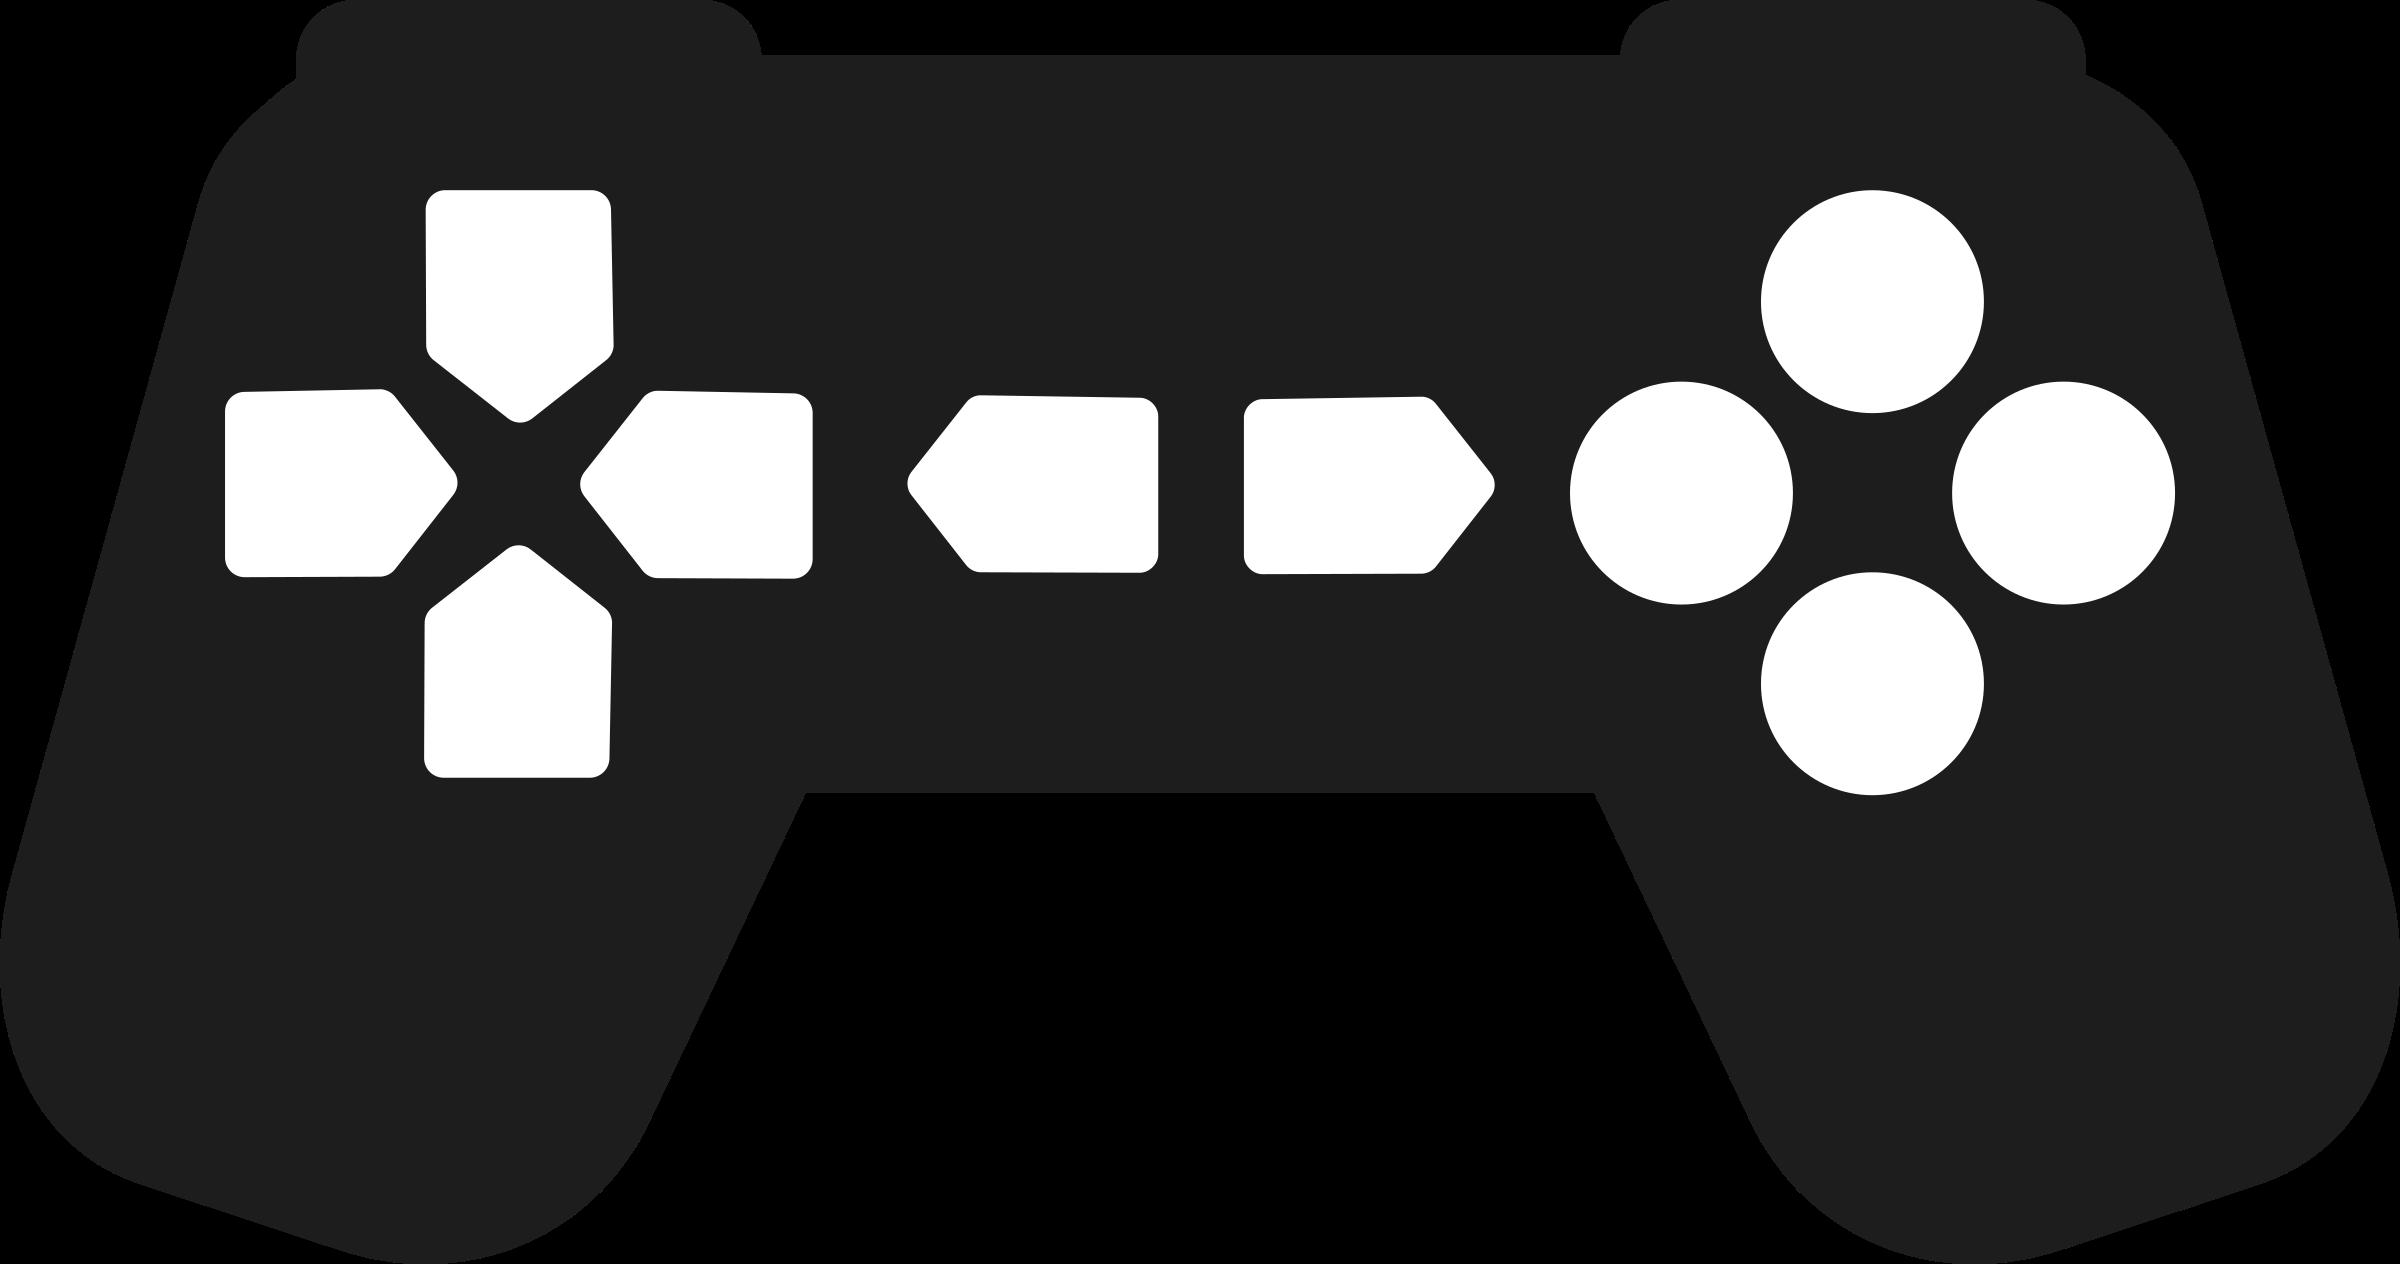 clip transparent download Game PNG Black And White Transparent Game Black And White